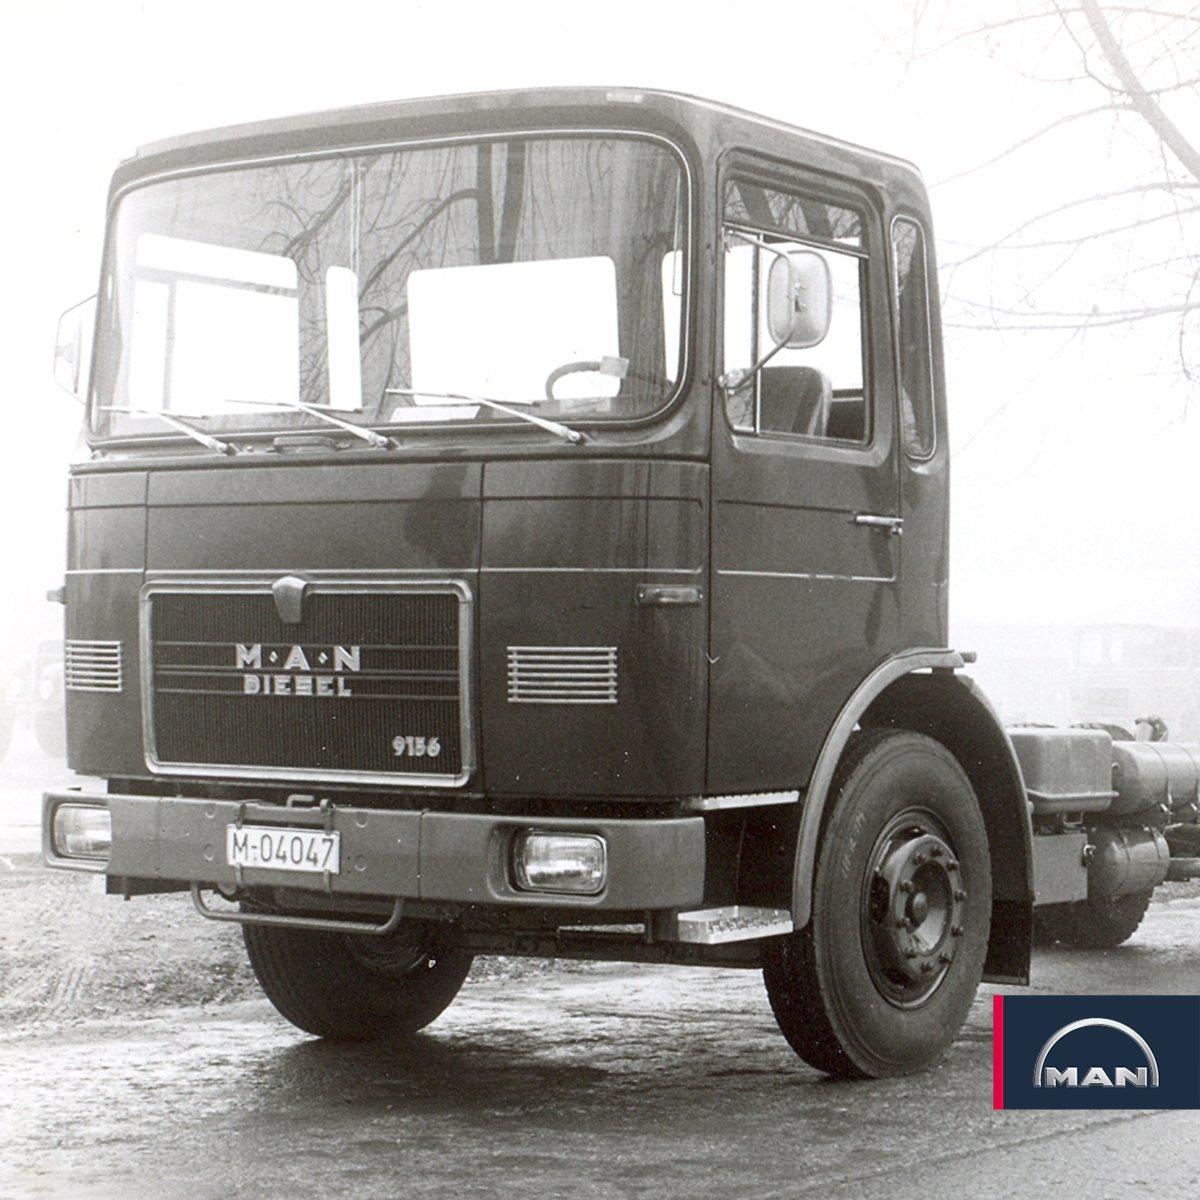 60'lı yılların efsane aslanı… #MAN #MANtruckandbusTurkey #MANkamyonveotobüs #TBT #tbt #throwback